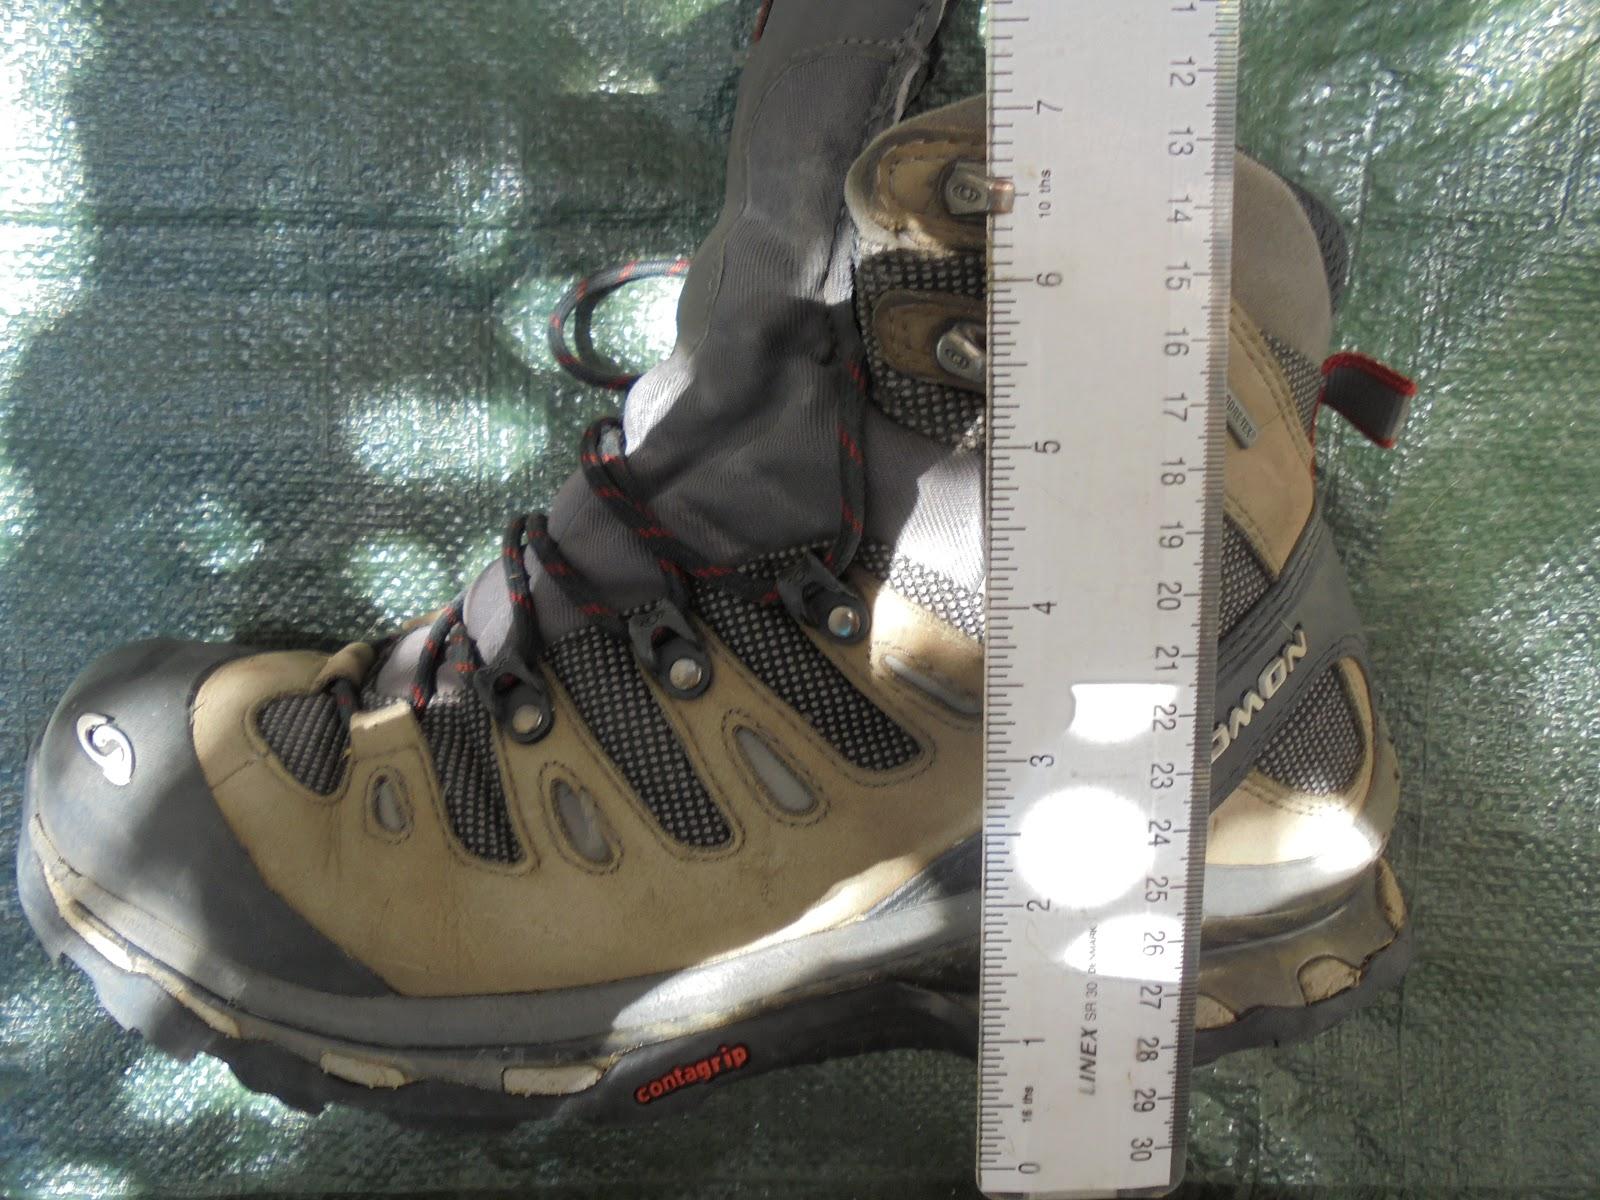 f62831cf1e Μια ημί-άκαμπτη μπότα στις 7 ίντσες.